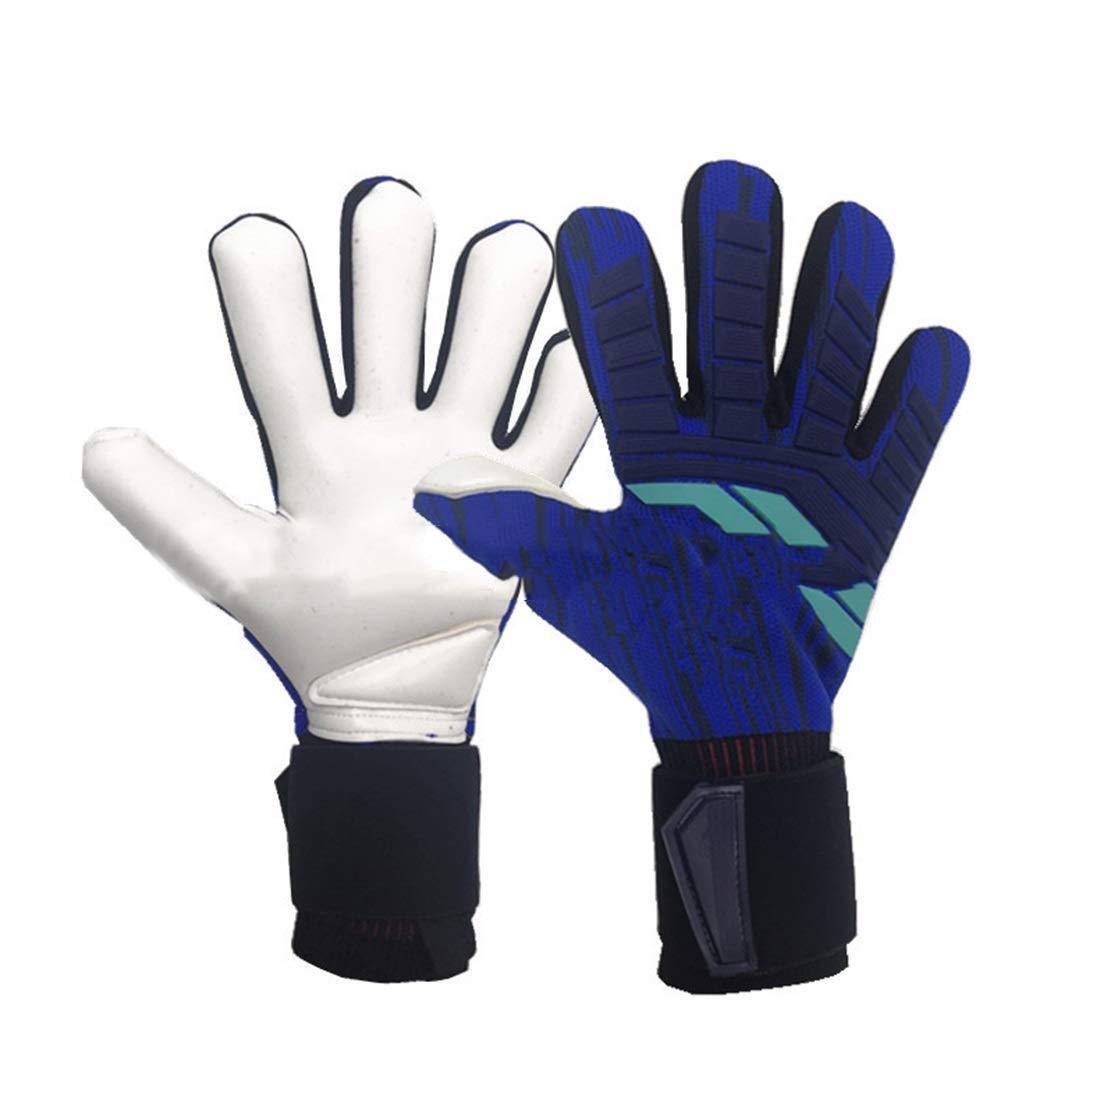 KERVINZHANG Fußball-Keeper Handschuh Greifen Anti-Rutsch-Stoßdämpfung Atmungsaktiv Haltbarkeit Training Futsal